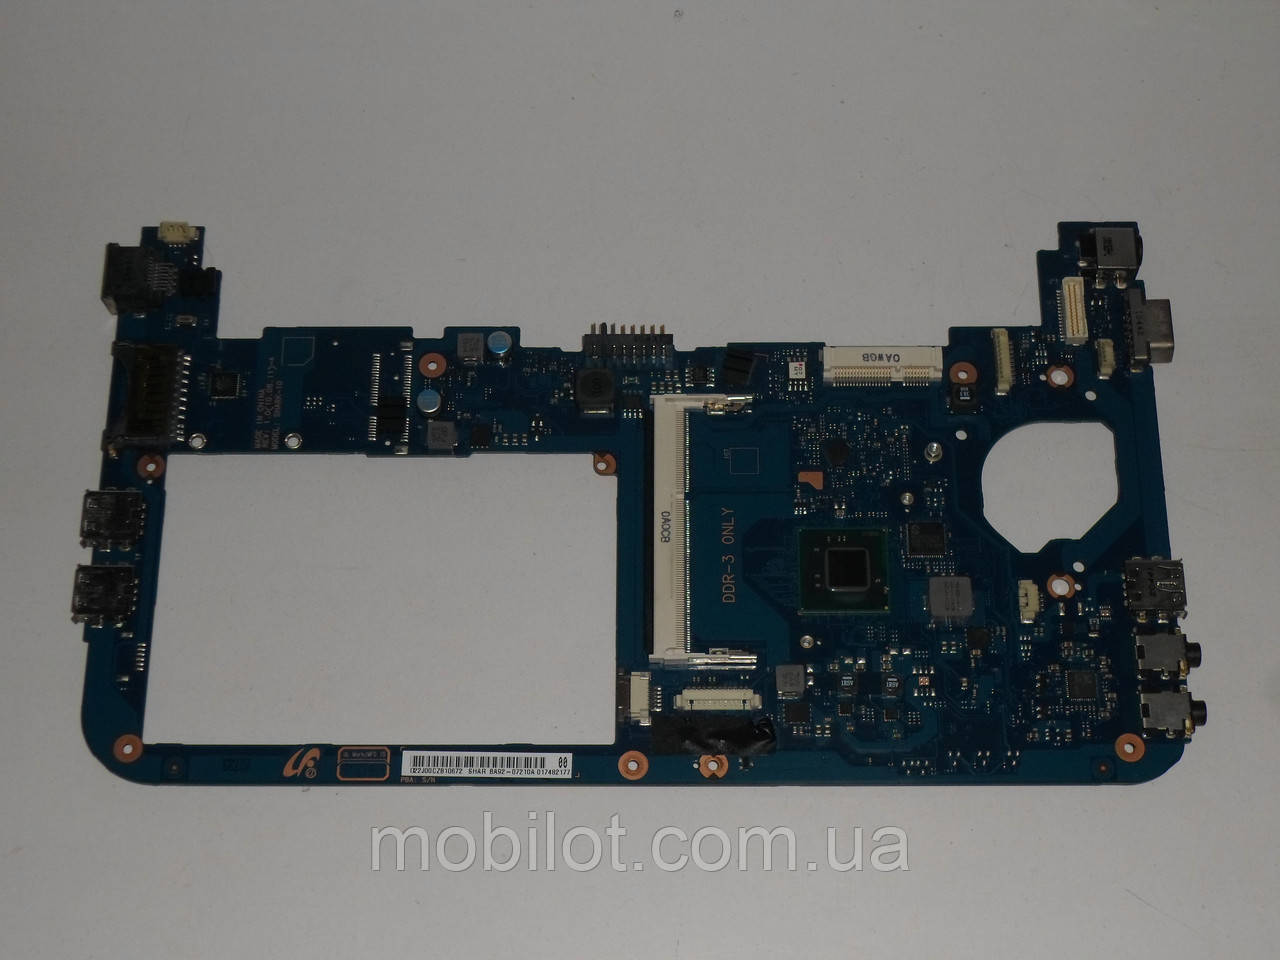 Материнская плата Samsung NF310 (NZ-7440)